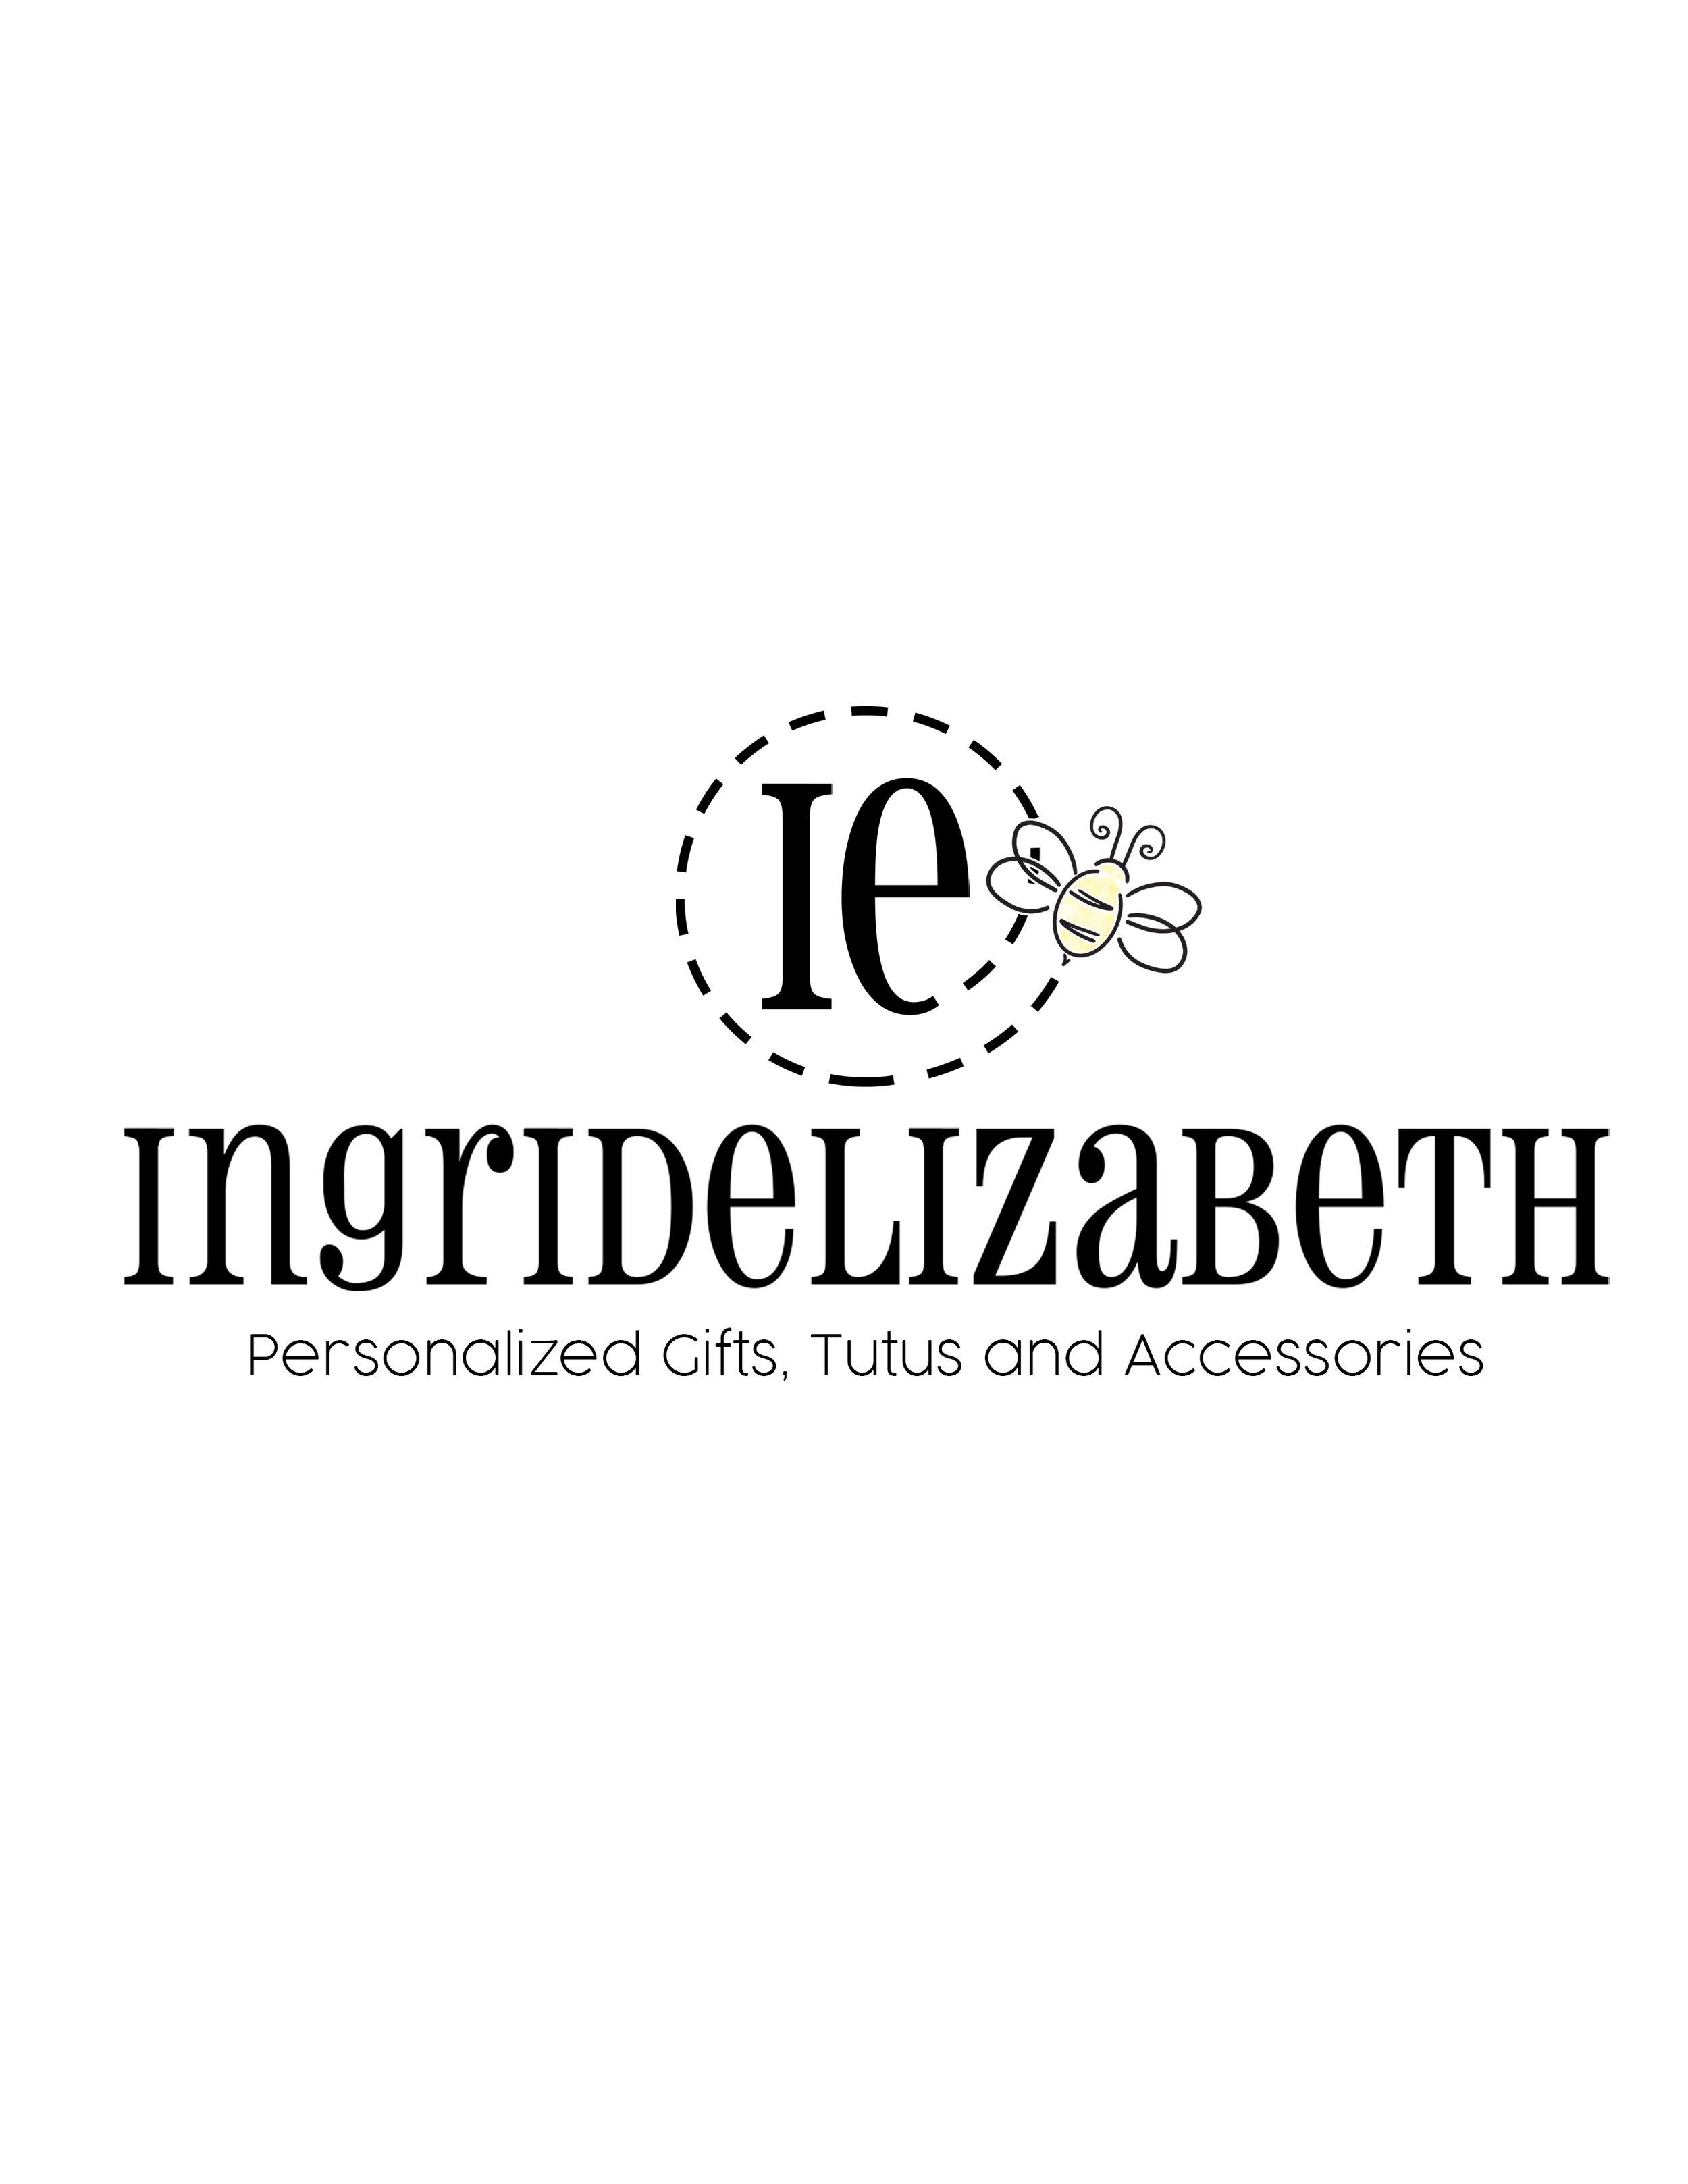 Ingridelizabeth logo.jpg